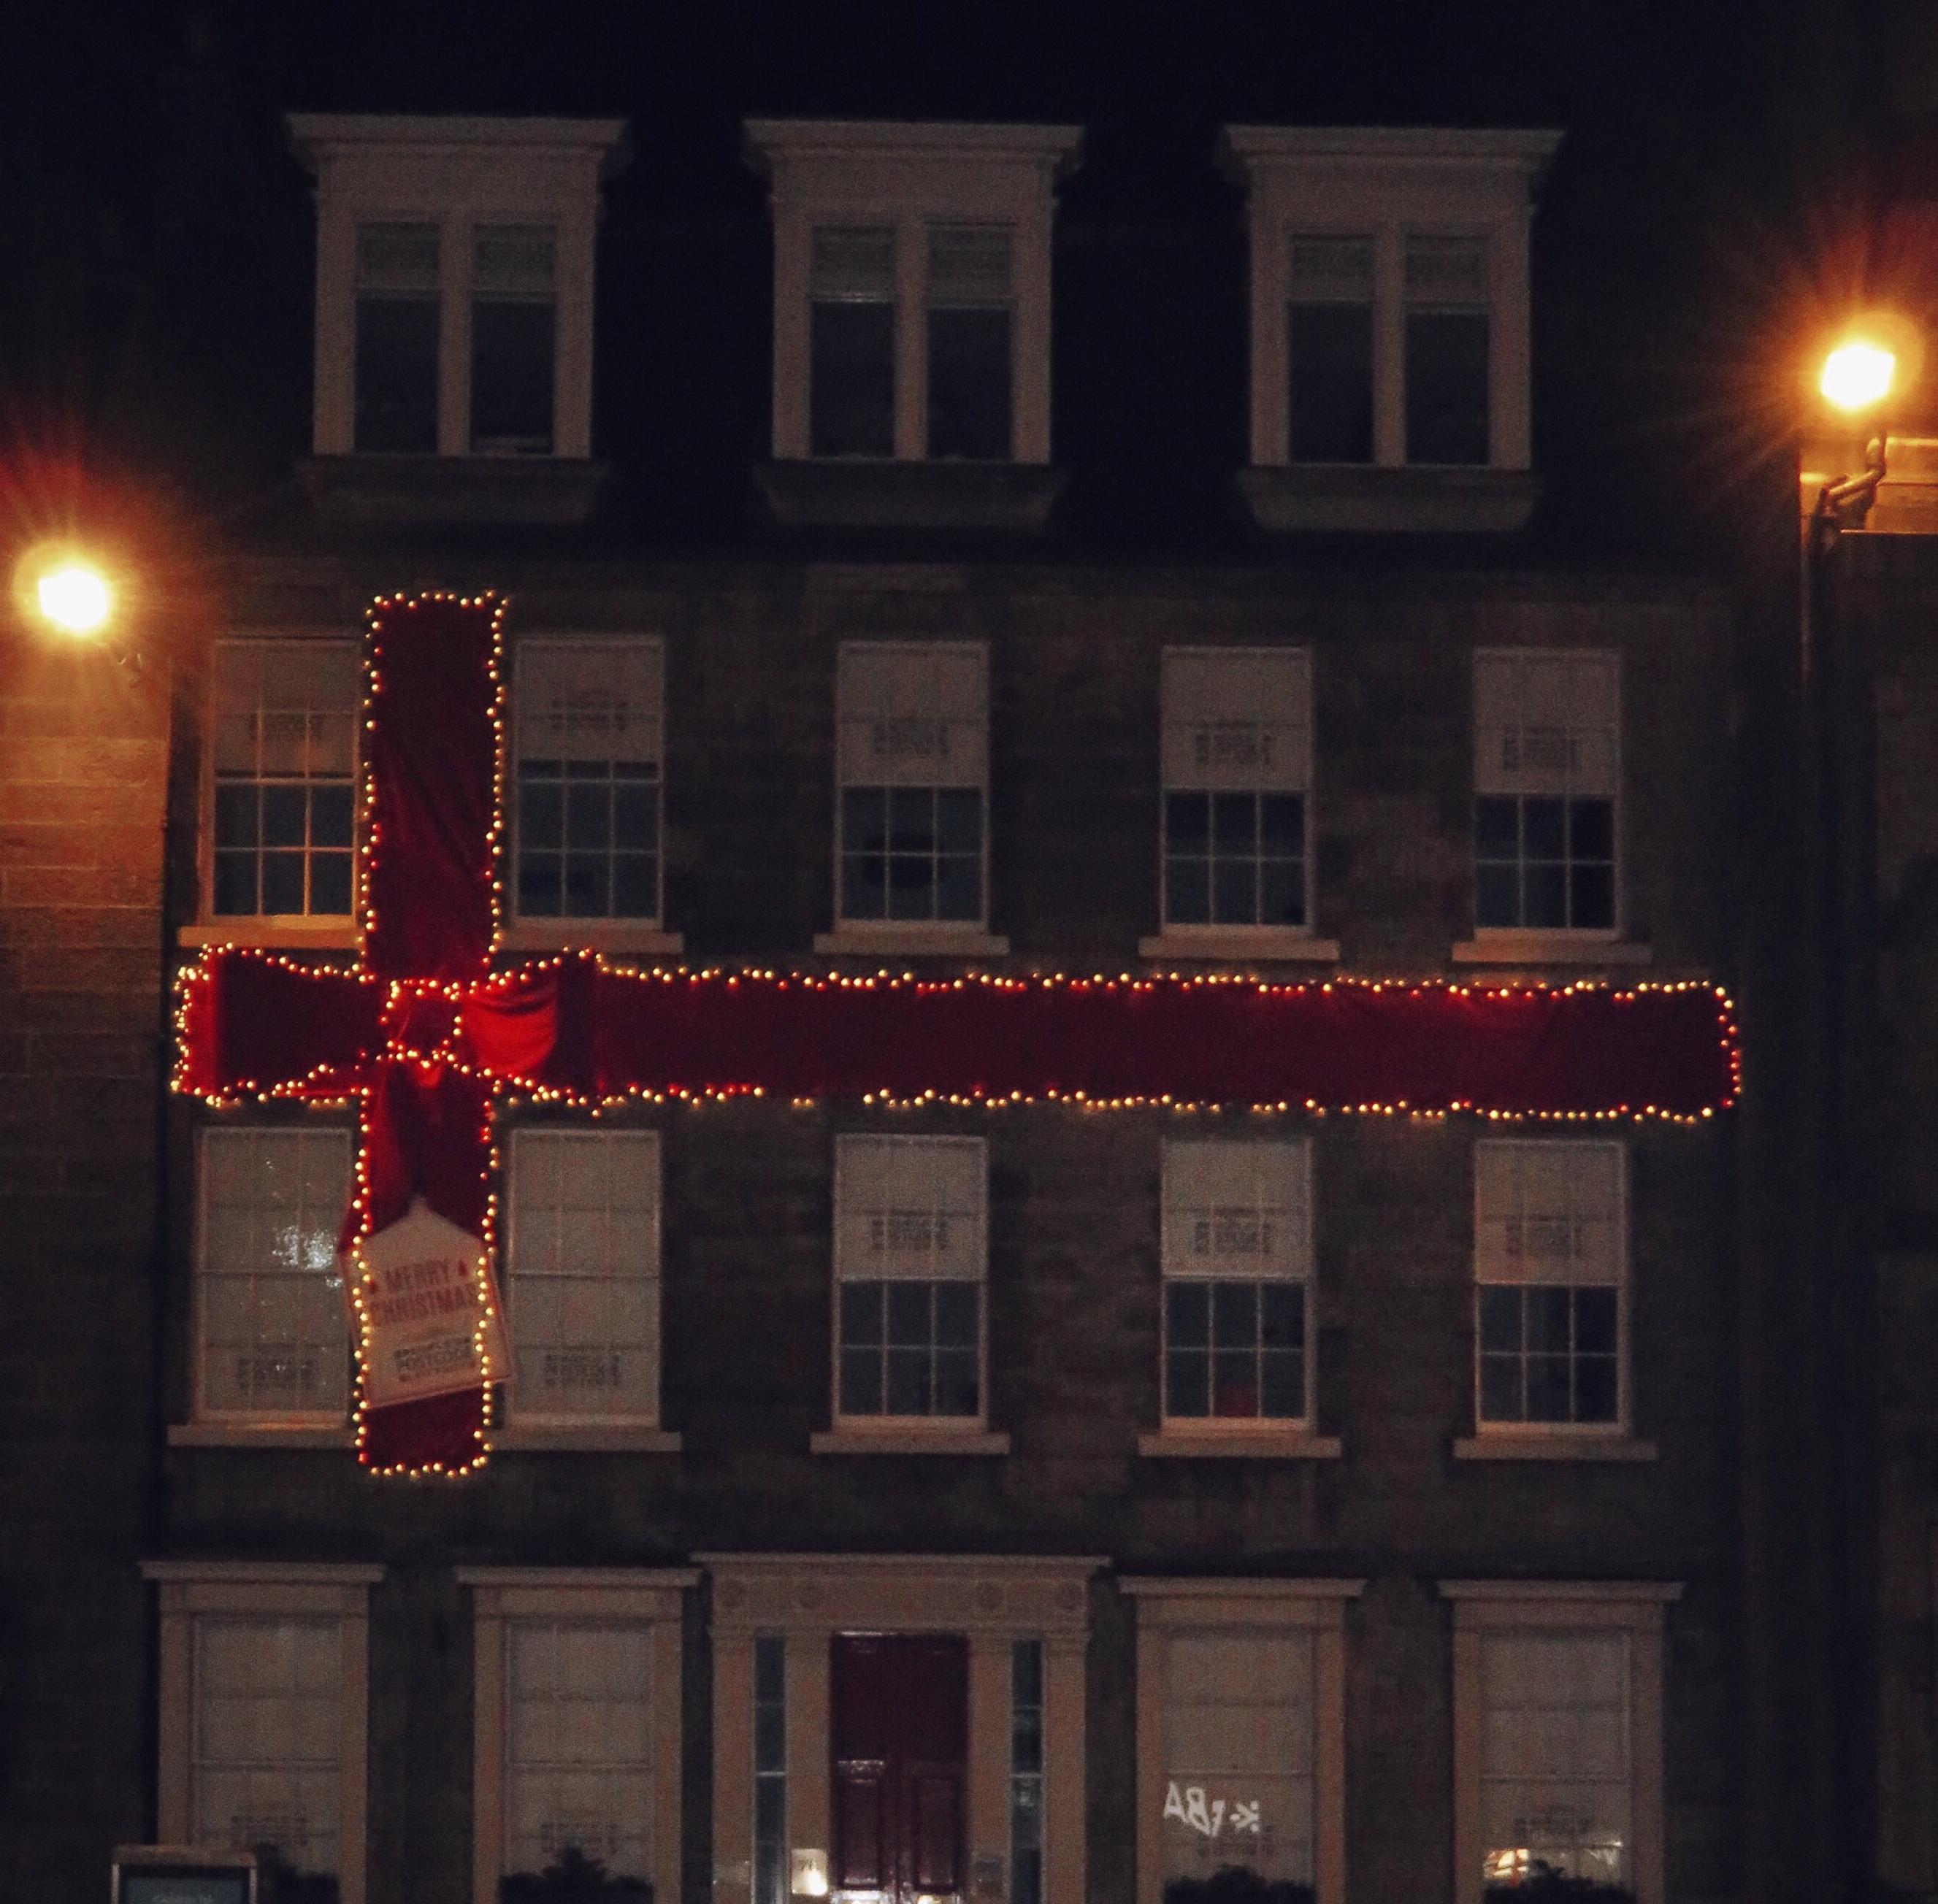 Light Shop In Edinburgh: Christmas Decorations In Edinburgh 2015